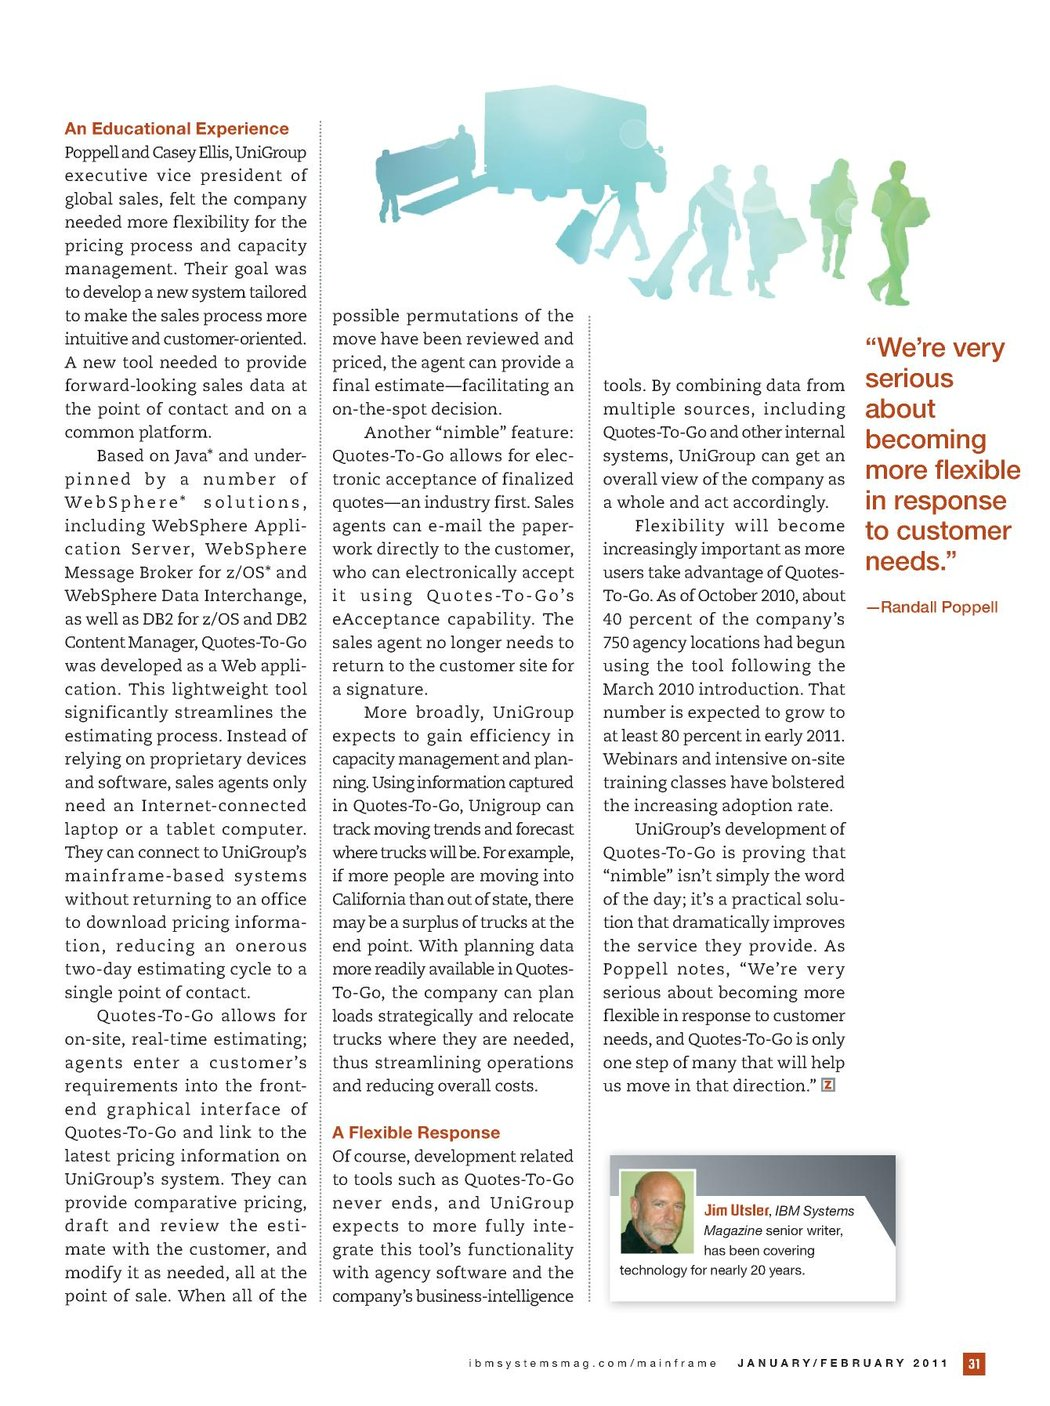 IBM Systems Magazine, Mainframe Edition - January/February 2011